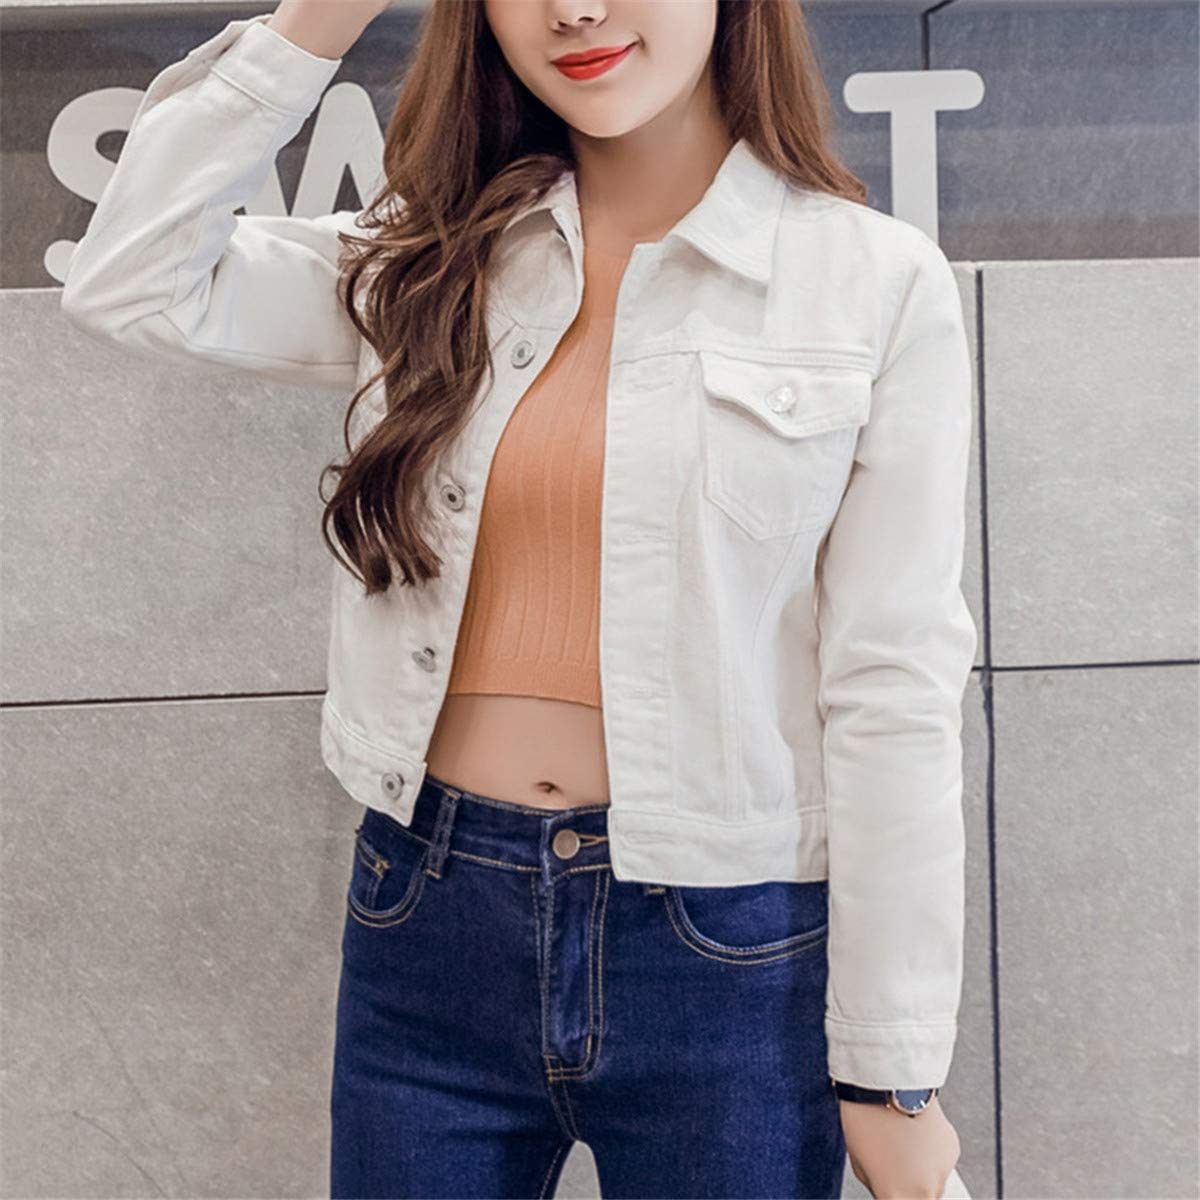 Thenxin Juniors Denim Jacket Cardigan Turn-Down Collar Long Sleeve Slim-fit Solid Color Jean Coat